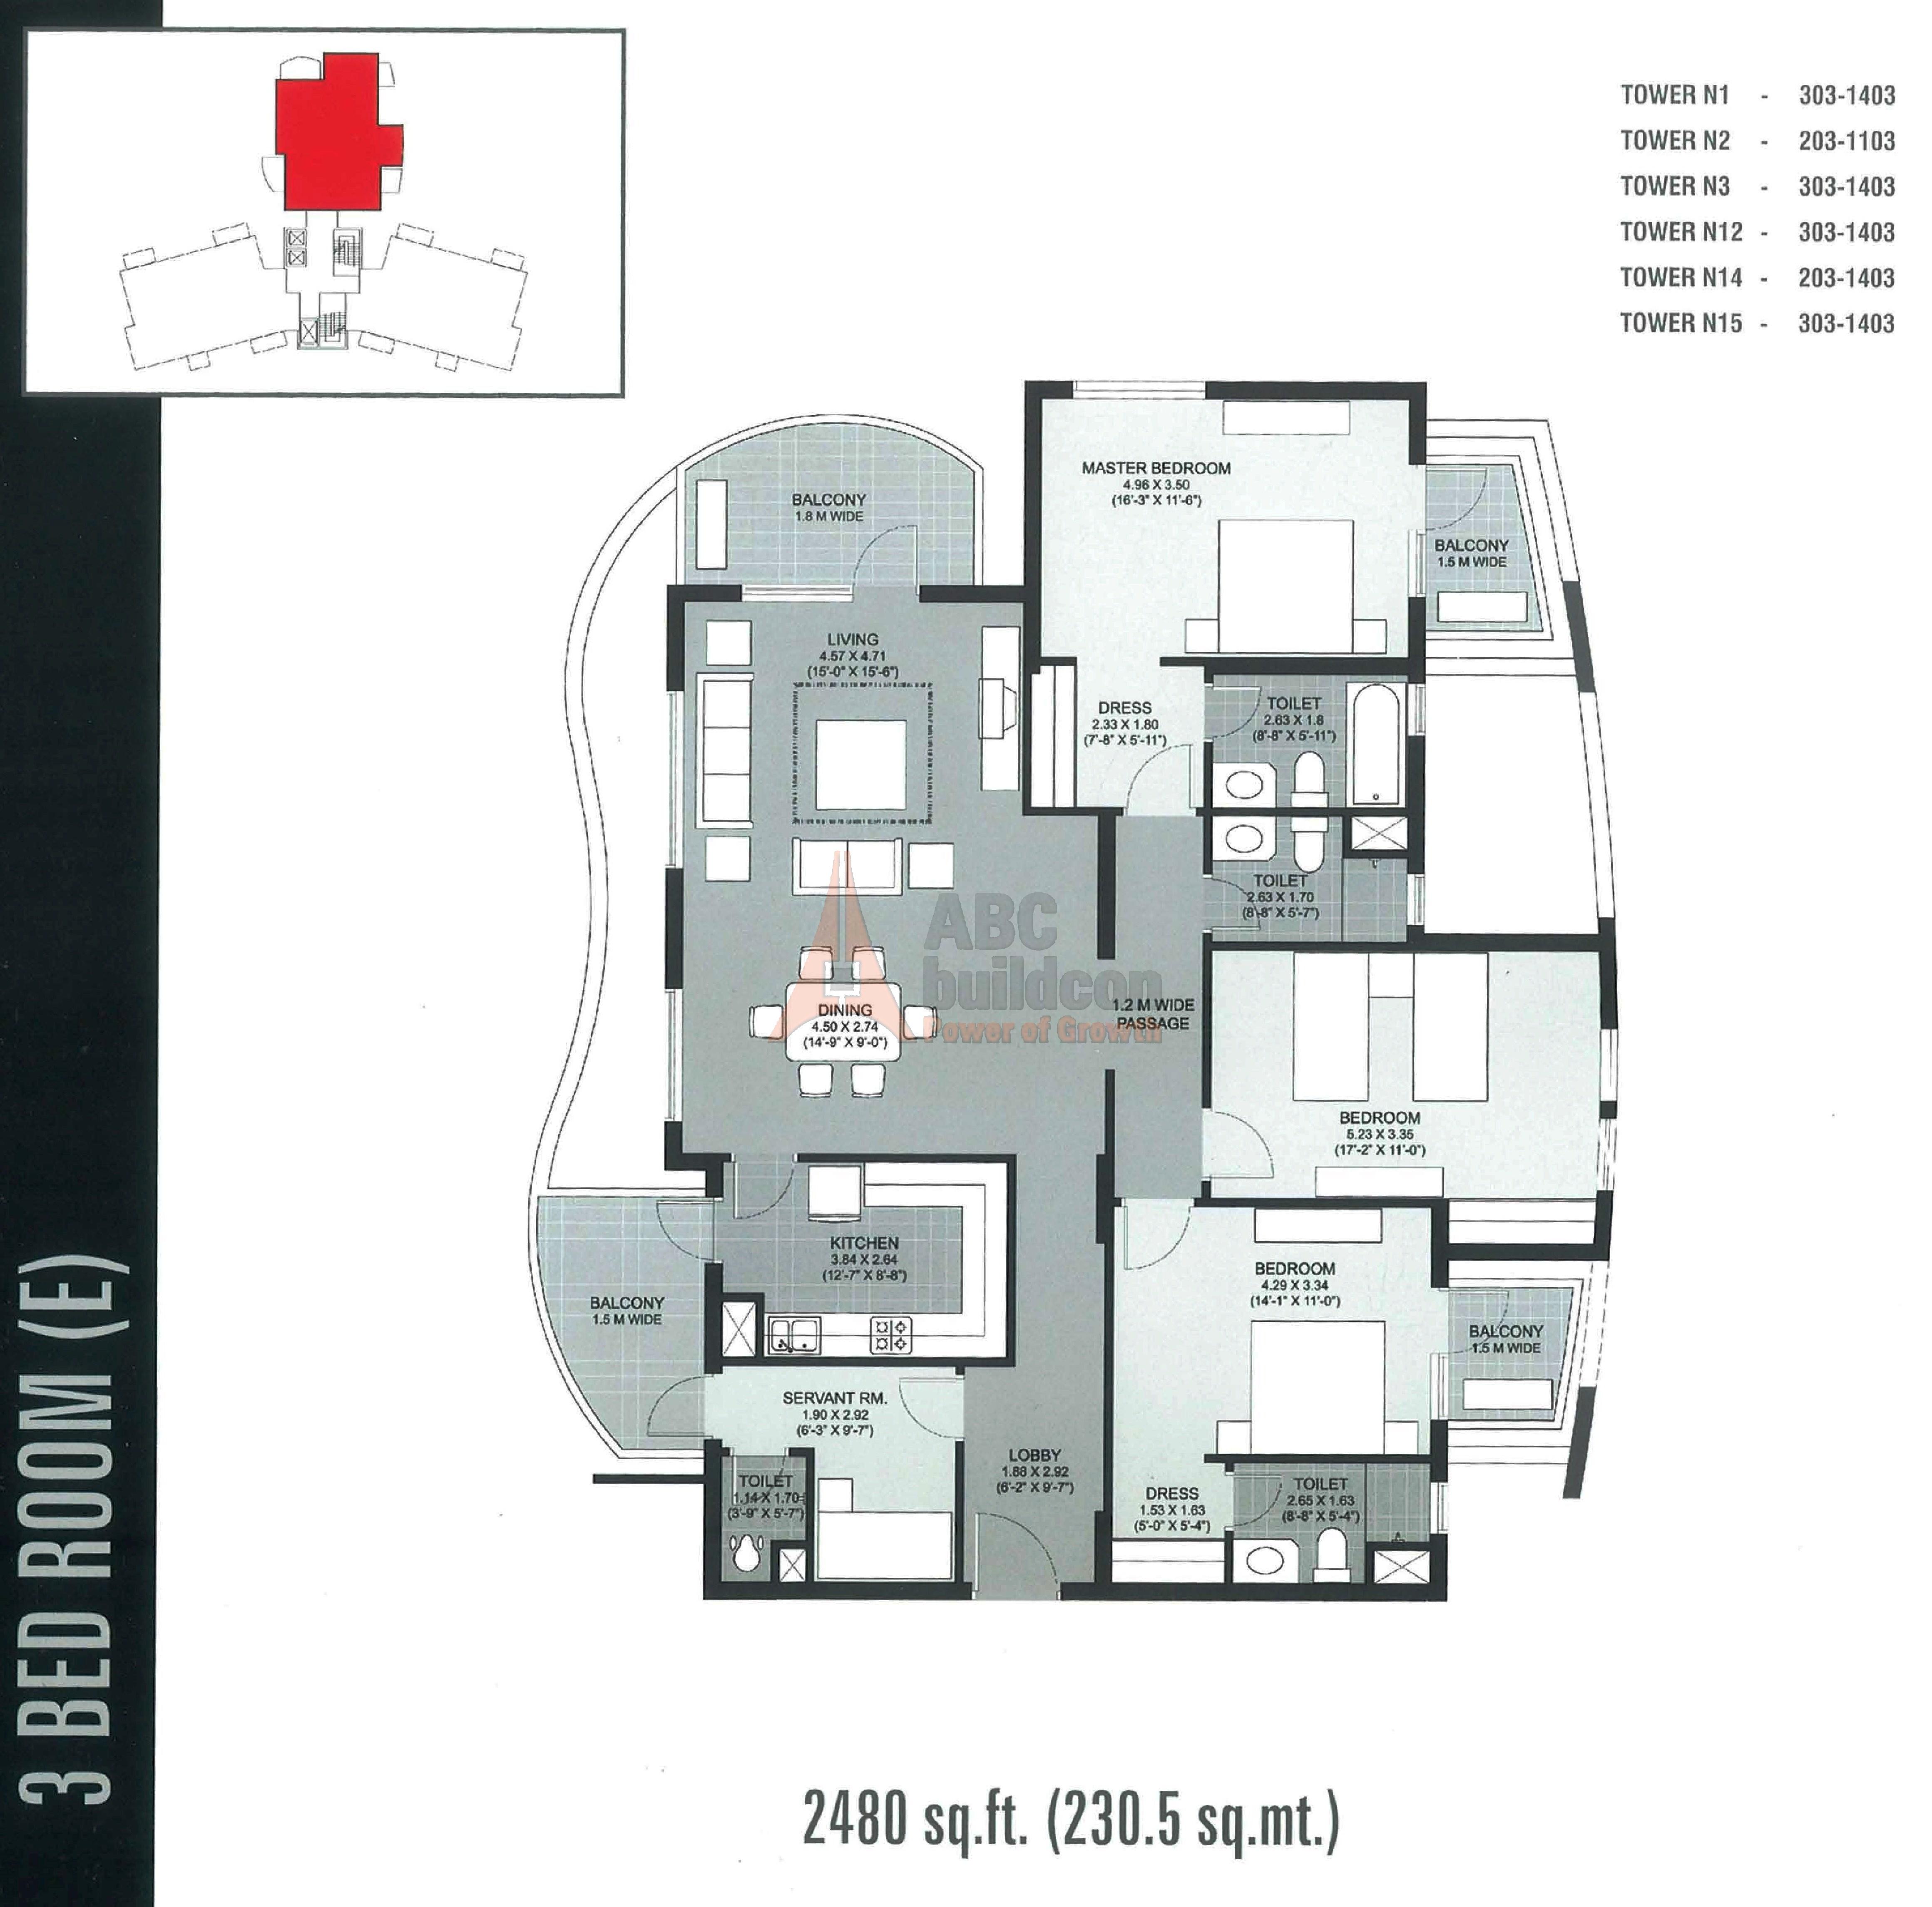 Unitech Close Floor Plan 3 Bhk S R 2480 Sq Ft